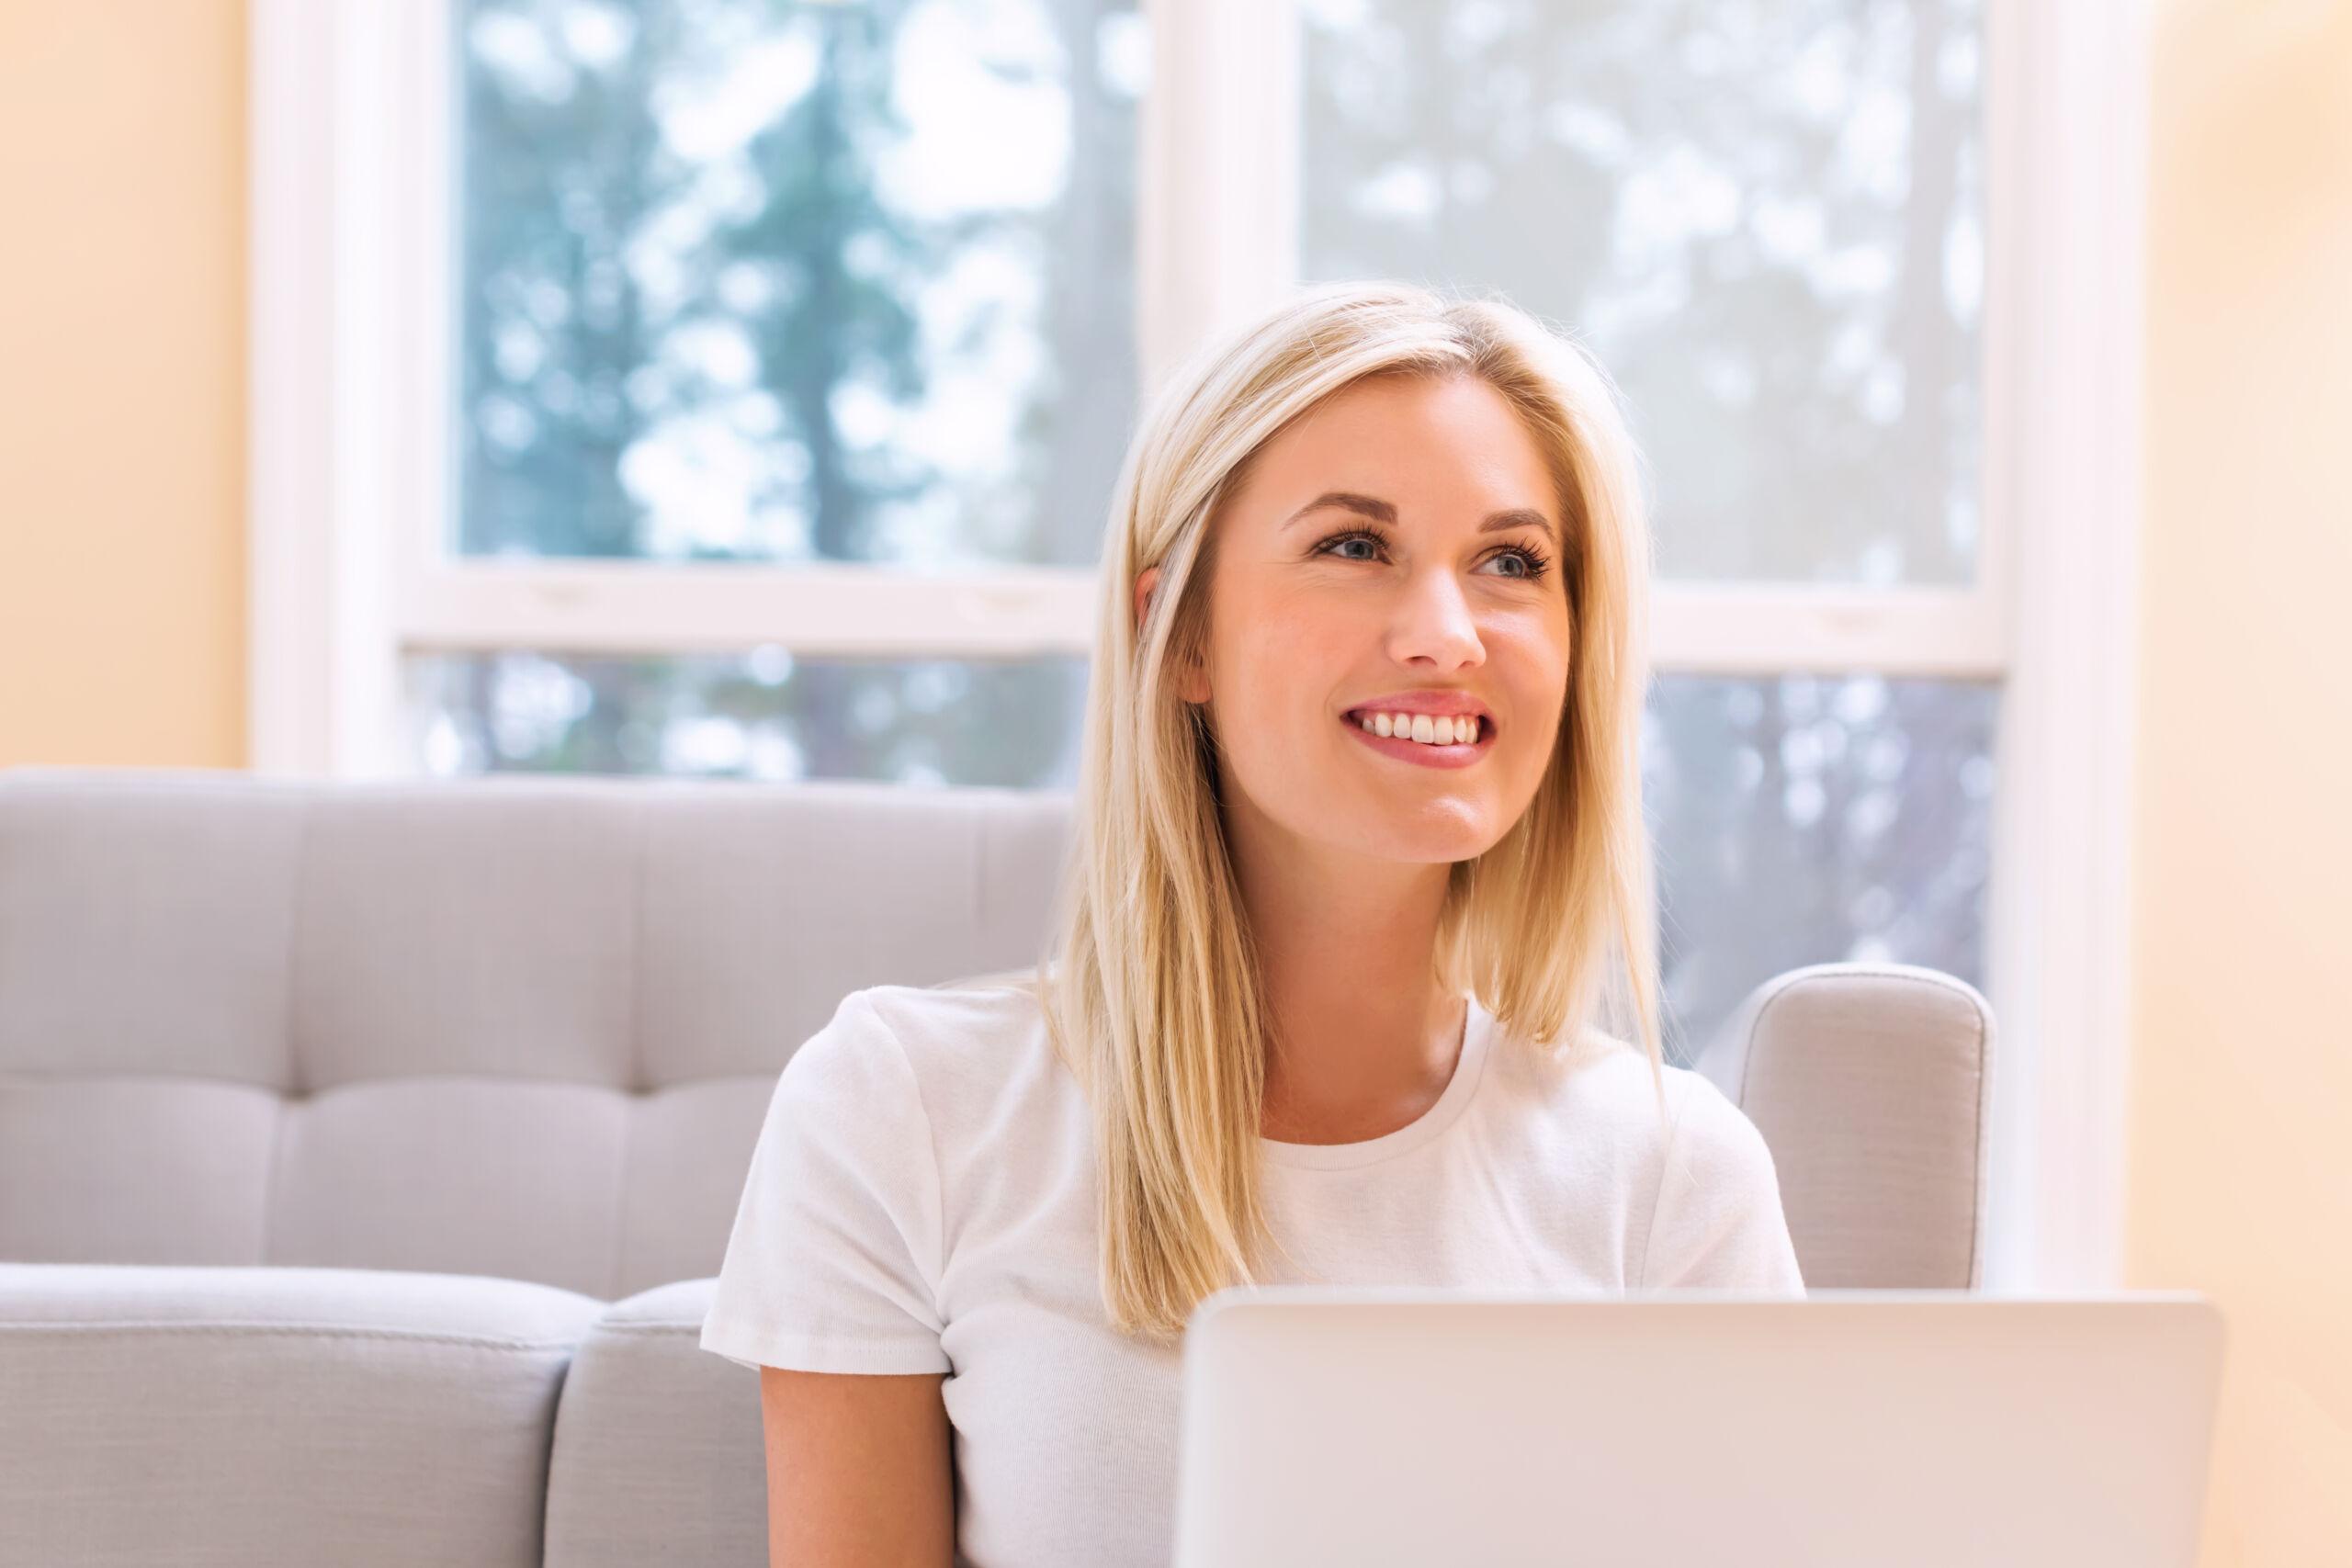 Freelance Proofreader QA Editor Job with KnowledgeWorks Global